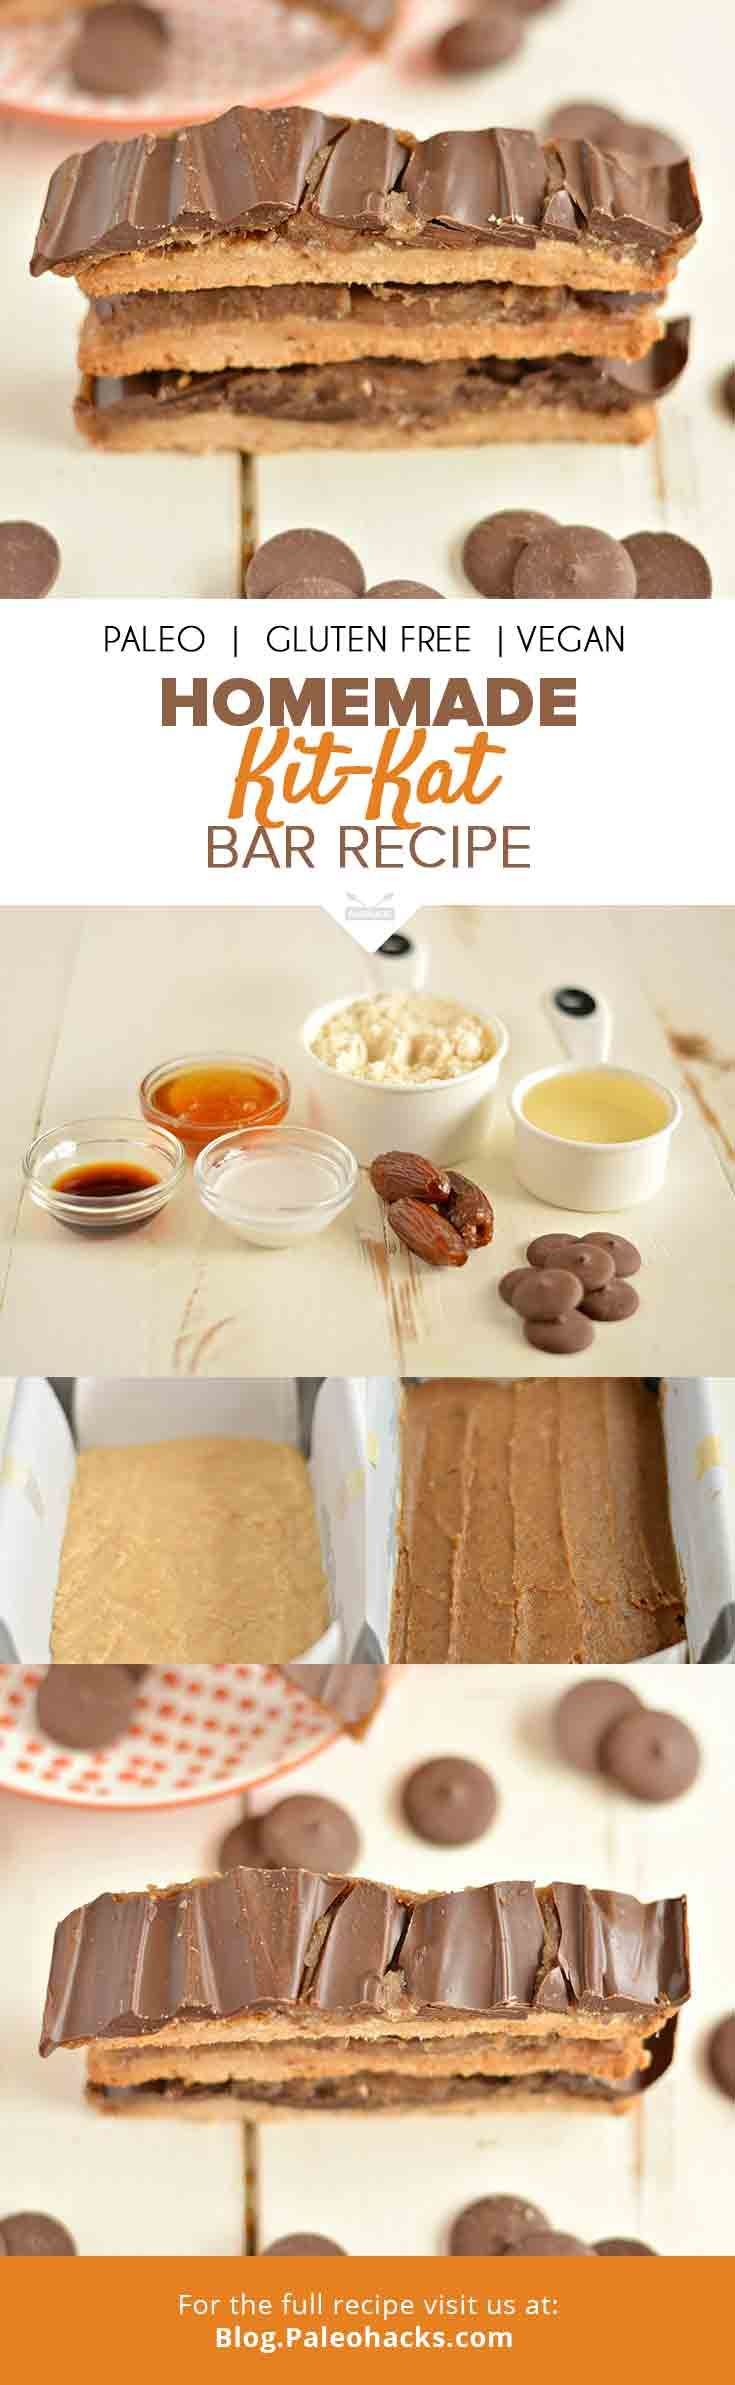 gluten-free grain-free paleo dessert recipe